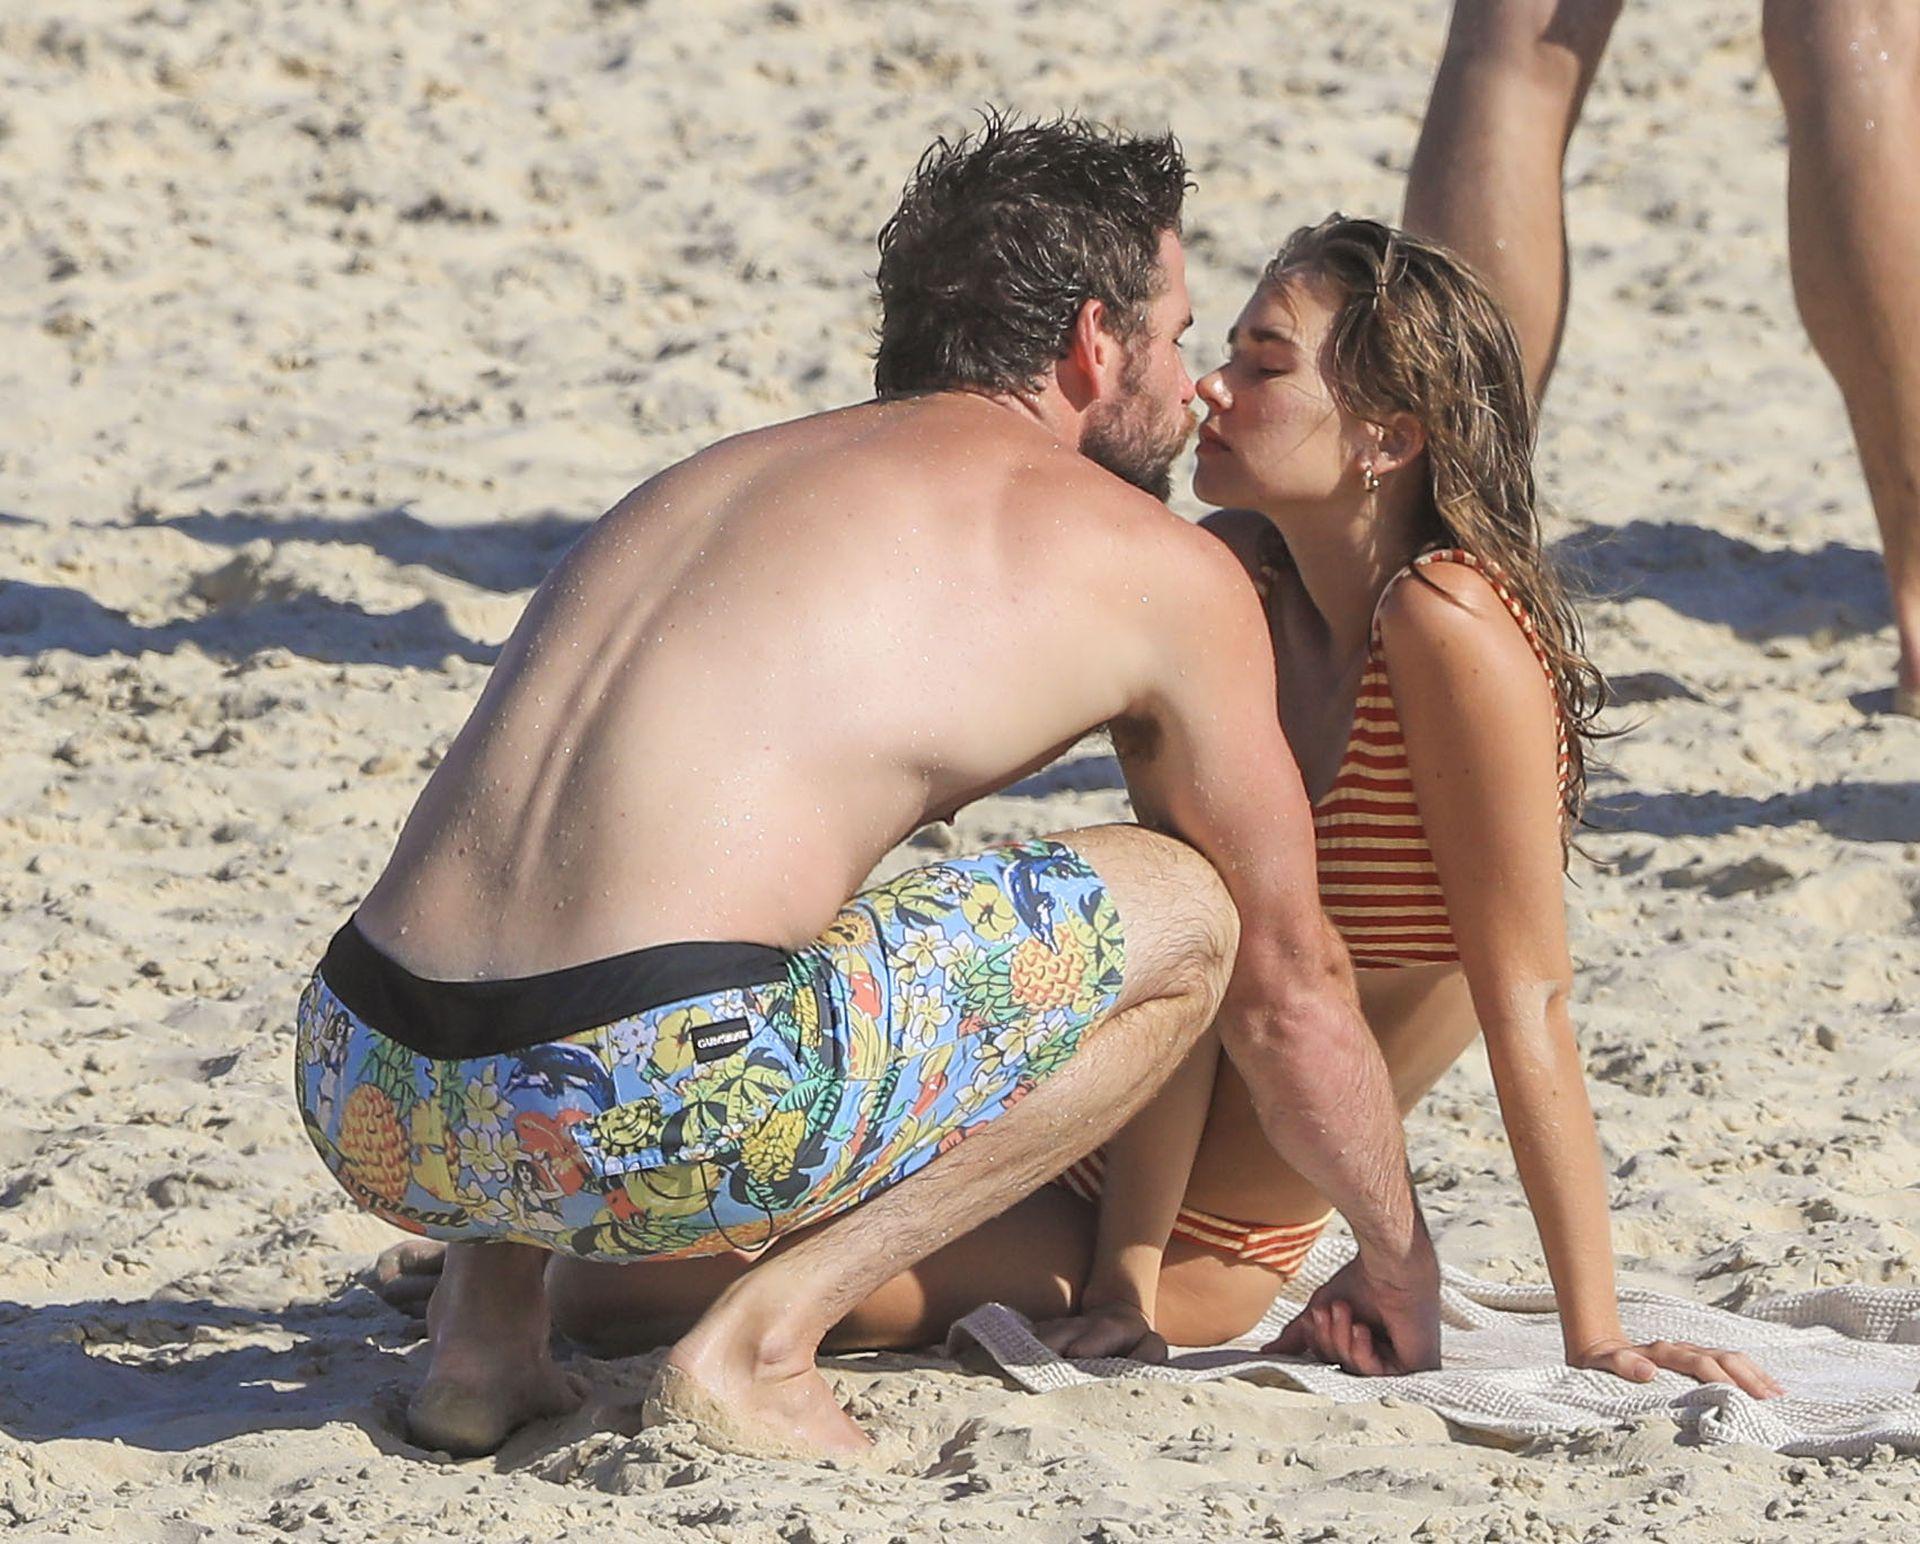 Gabriella Brooks Hot – Liam Hemsworth's New Girlfriend 0009